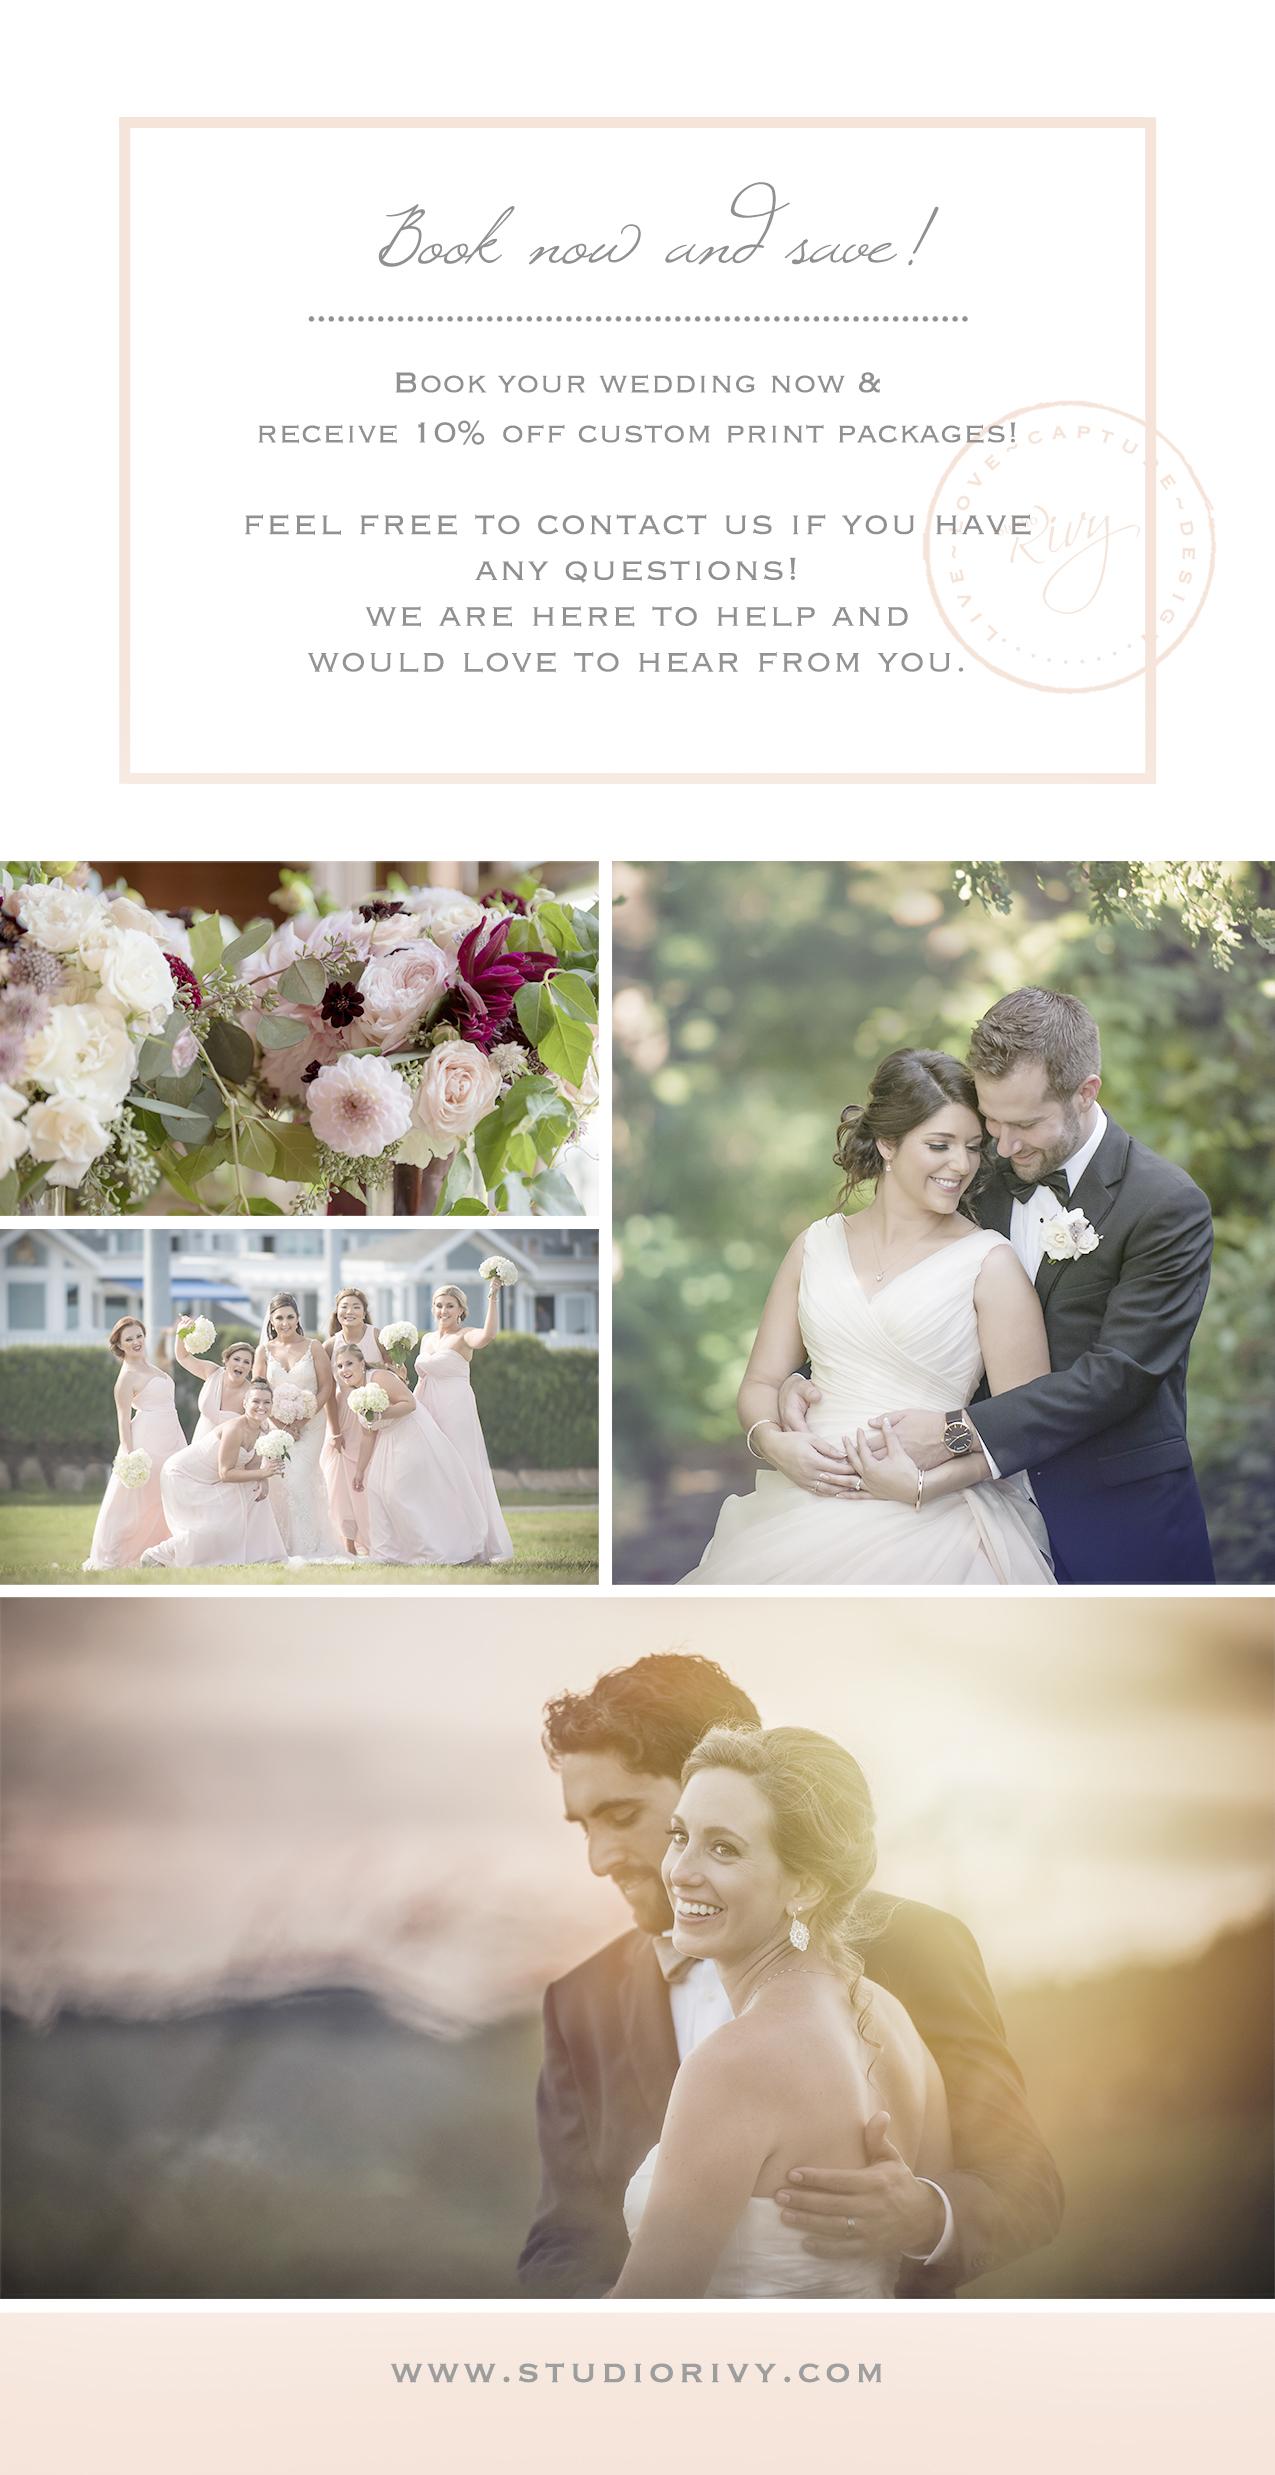 2017-4x8_press_card_front_wedding.jpg